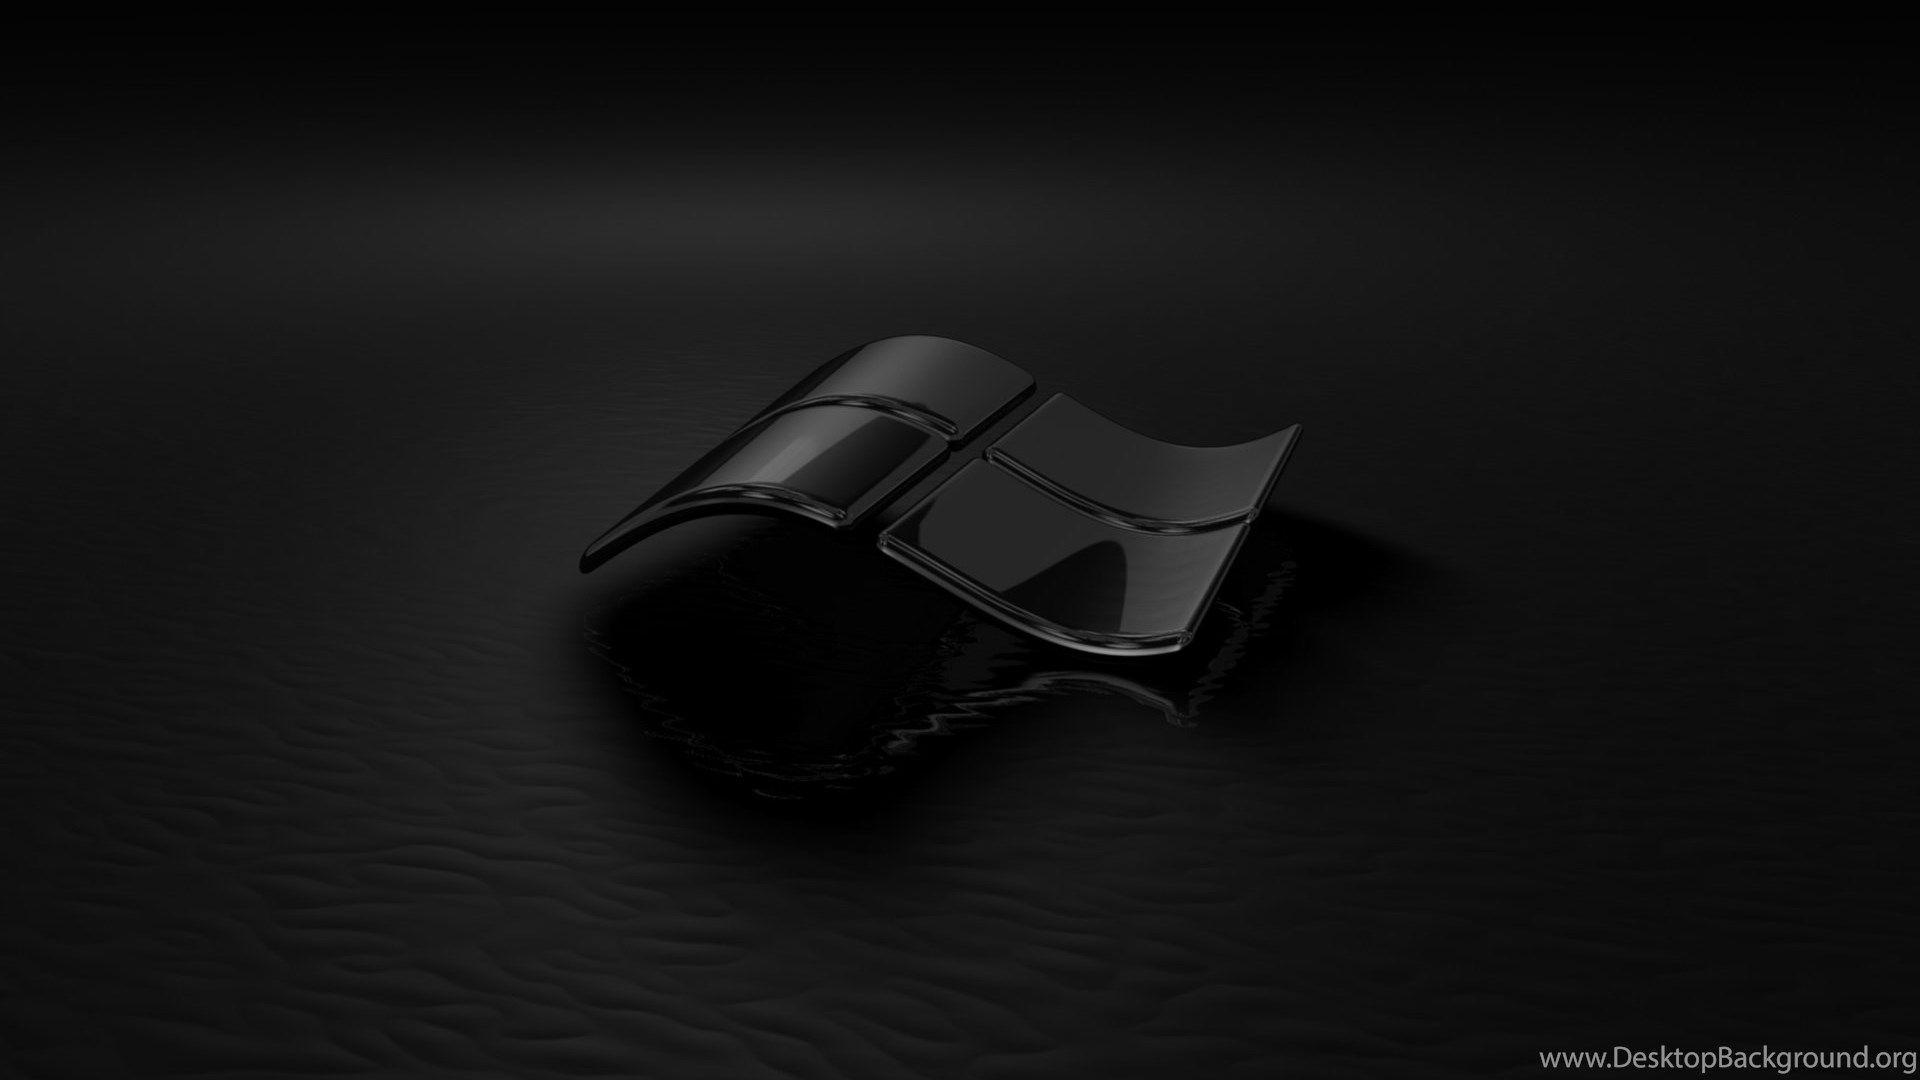 4k Black Desktop Wallpaper Galeri Duvar Kagitlari Telefonlar